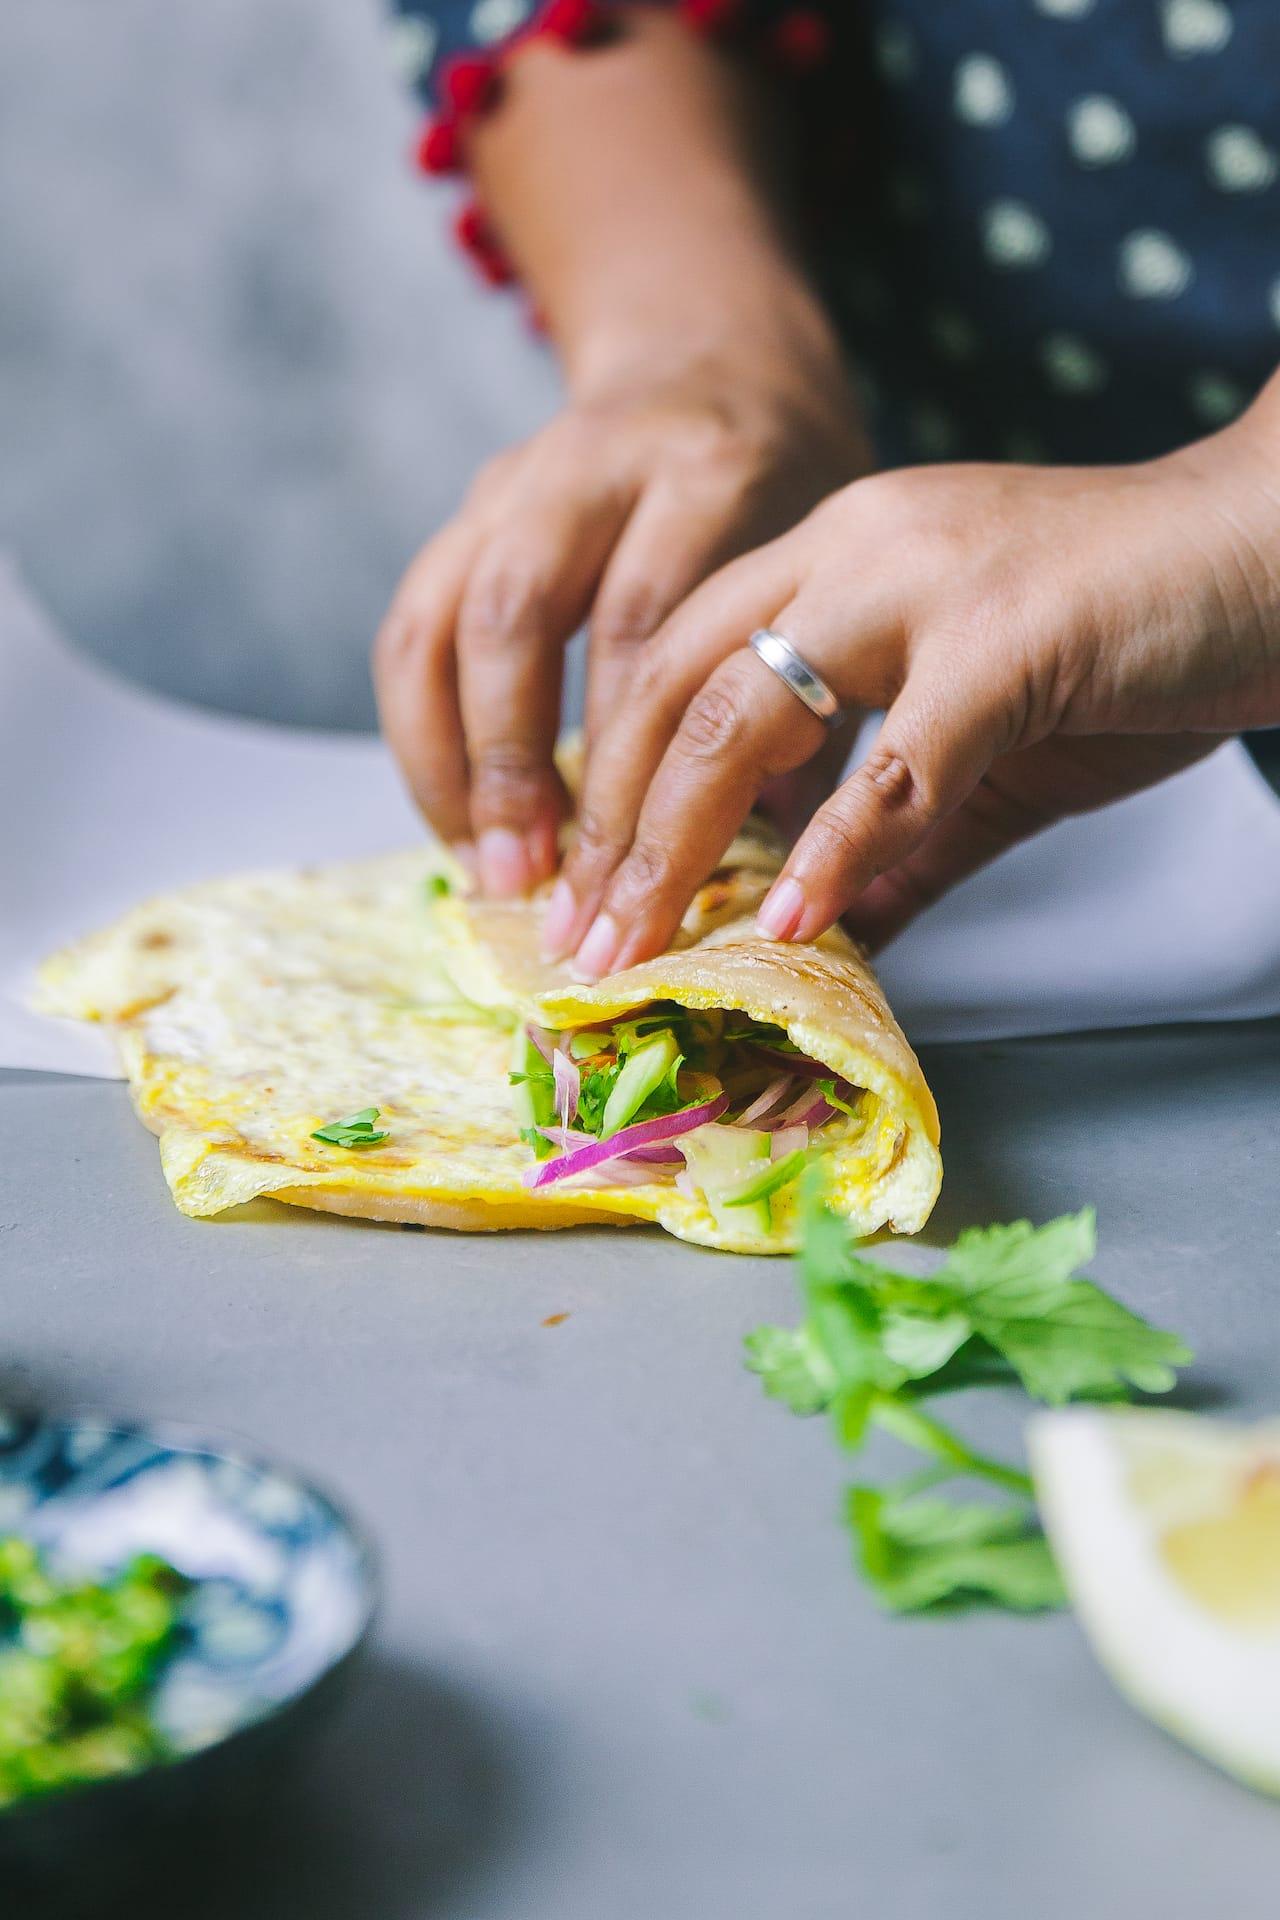 Indian street food made easy at home! #eggroll #foodpotography #kolkata #wrap #vegetarain